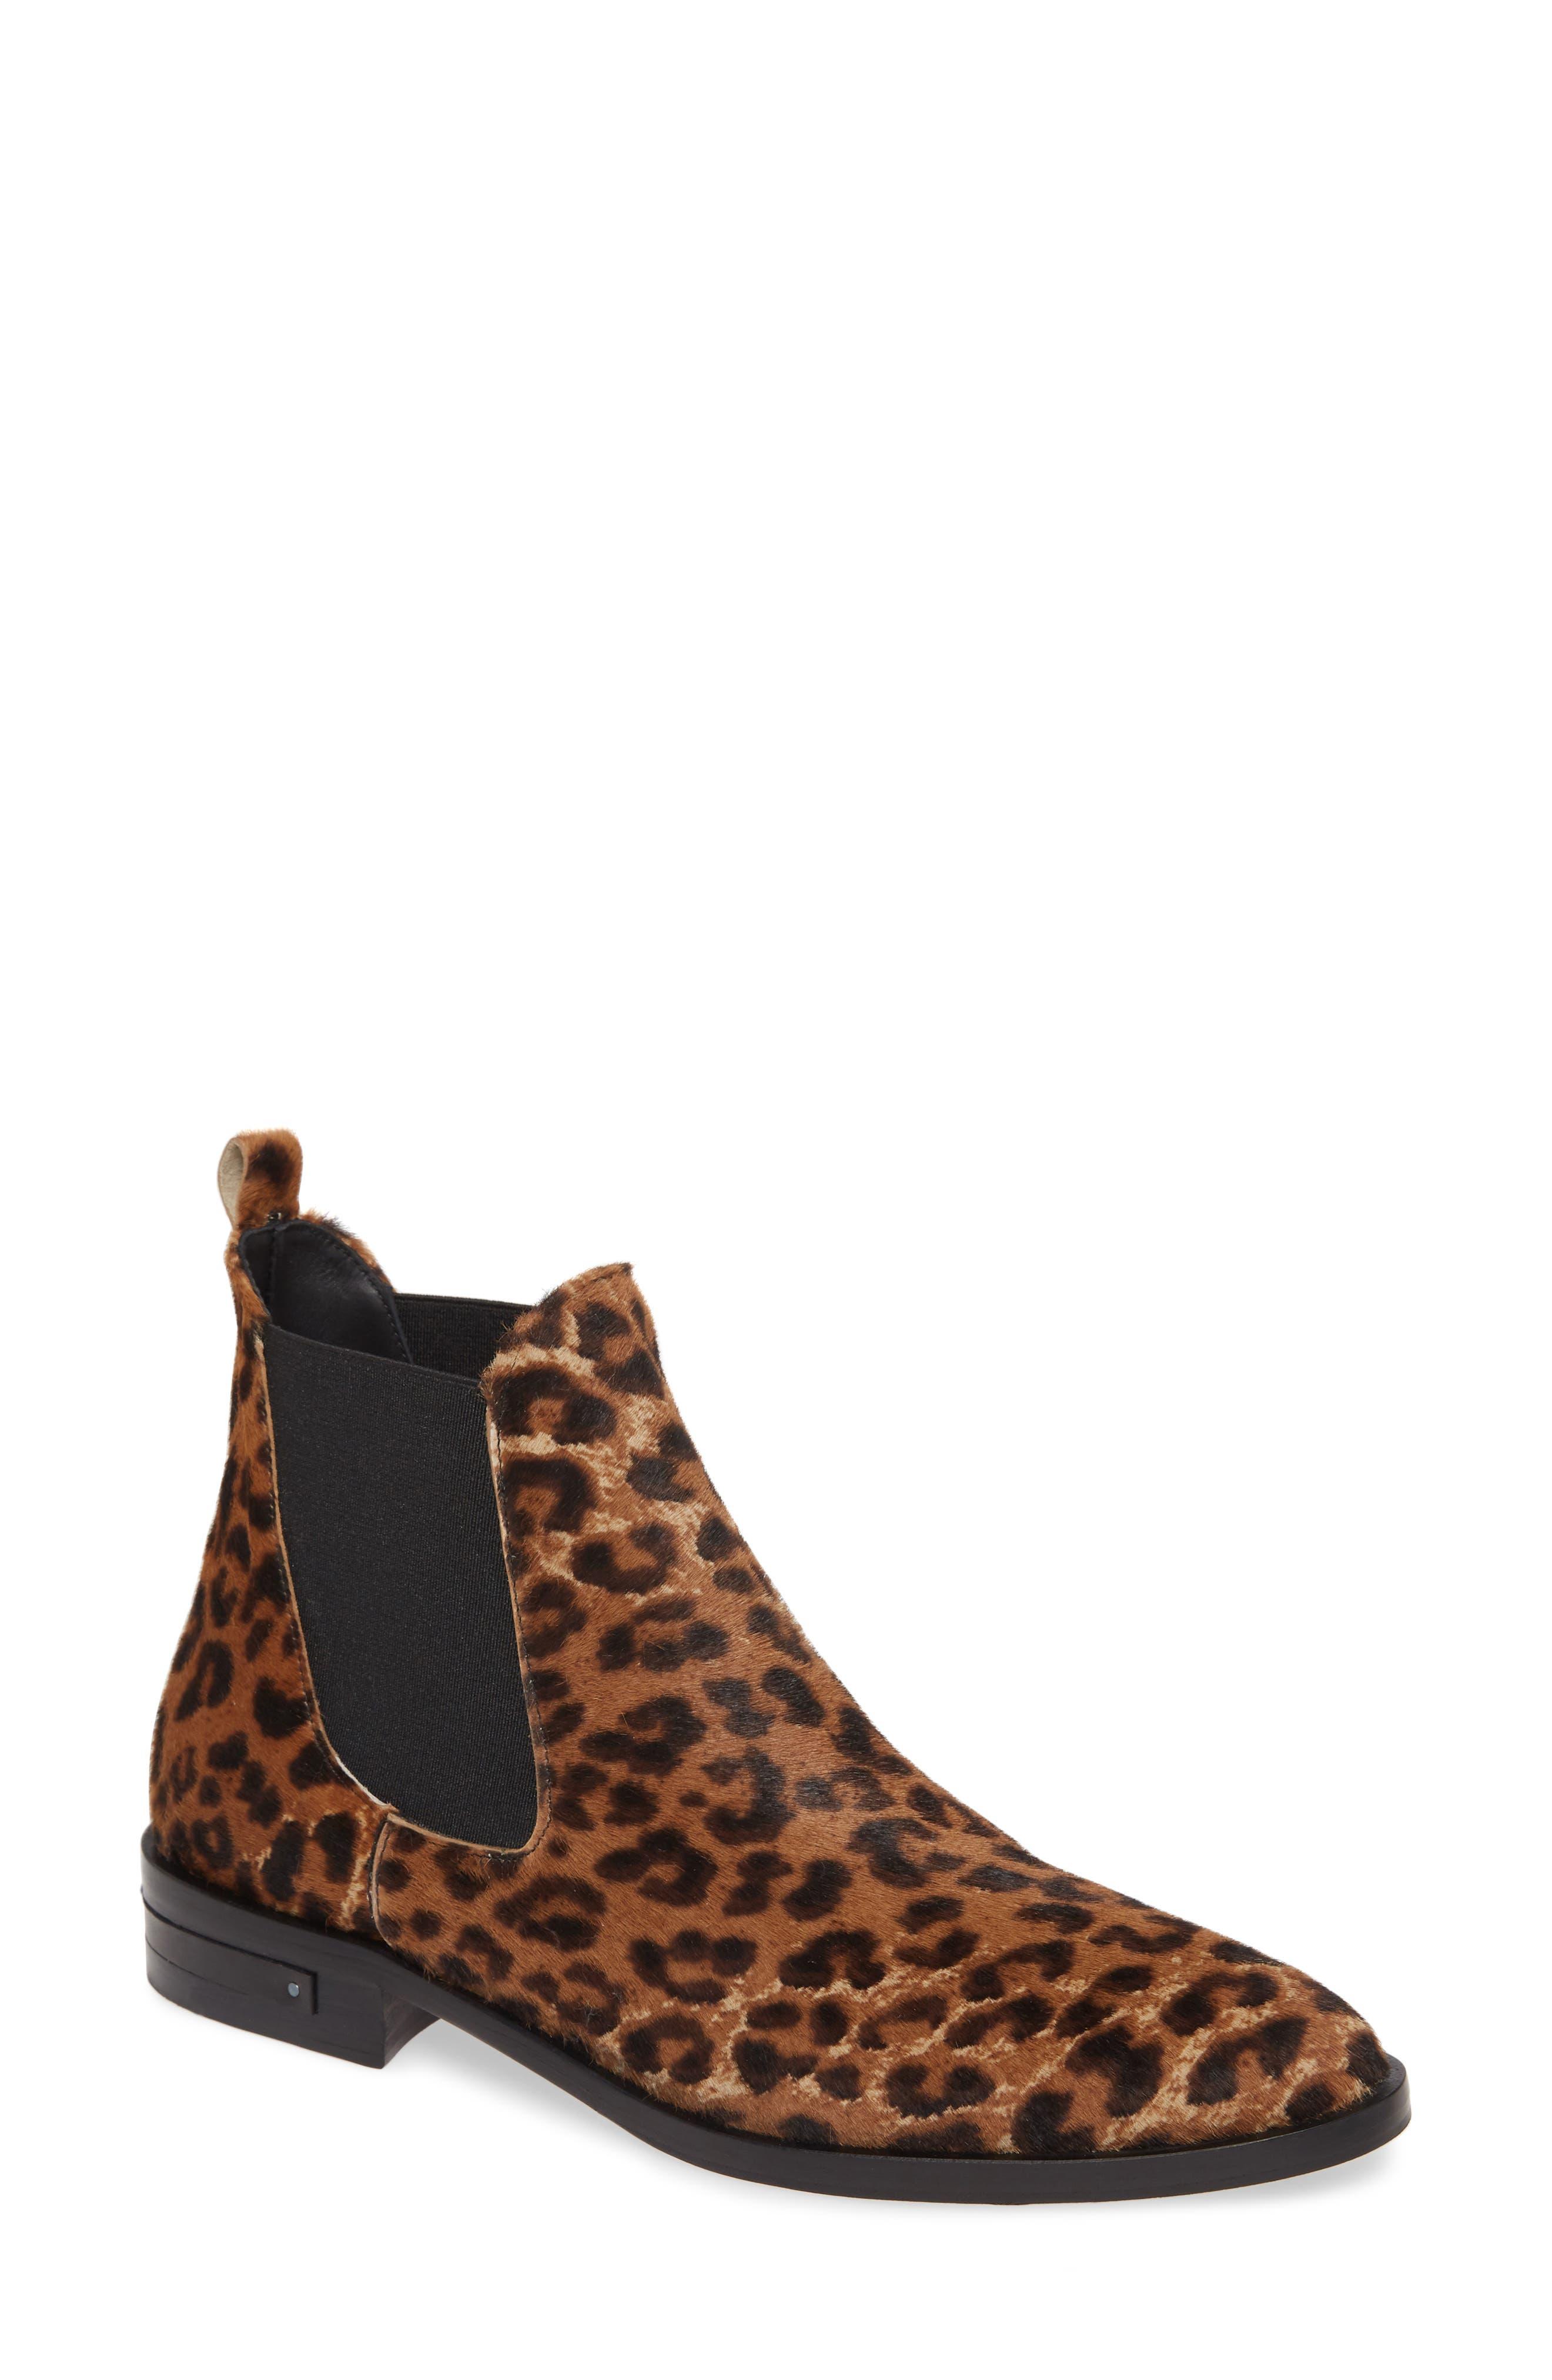 Image of FREDA SALVADOR Sleek Genuine Calf Hair Chelsea Boot